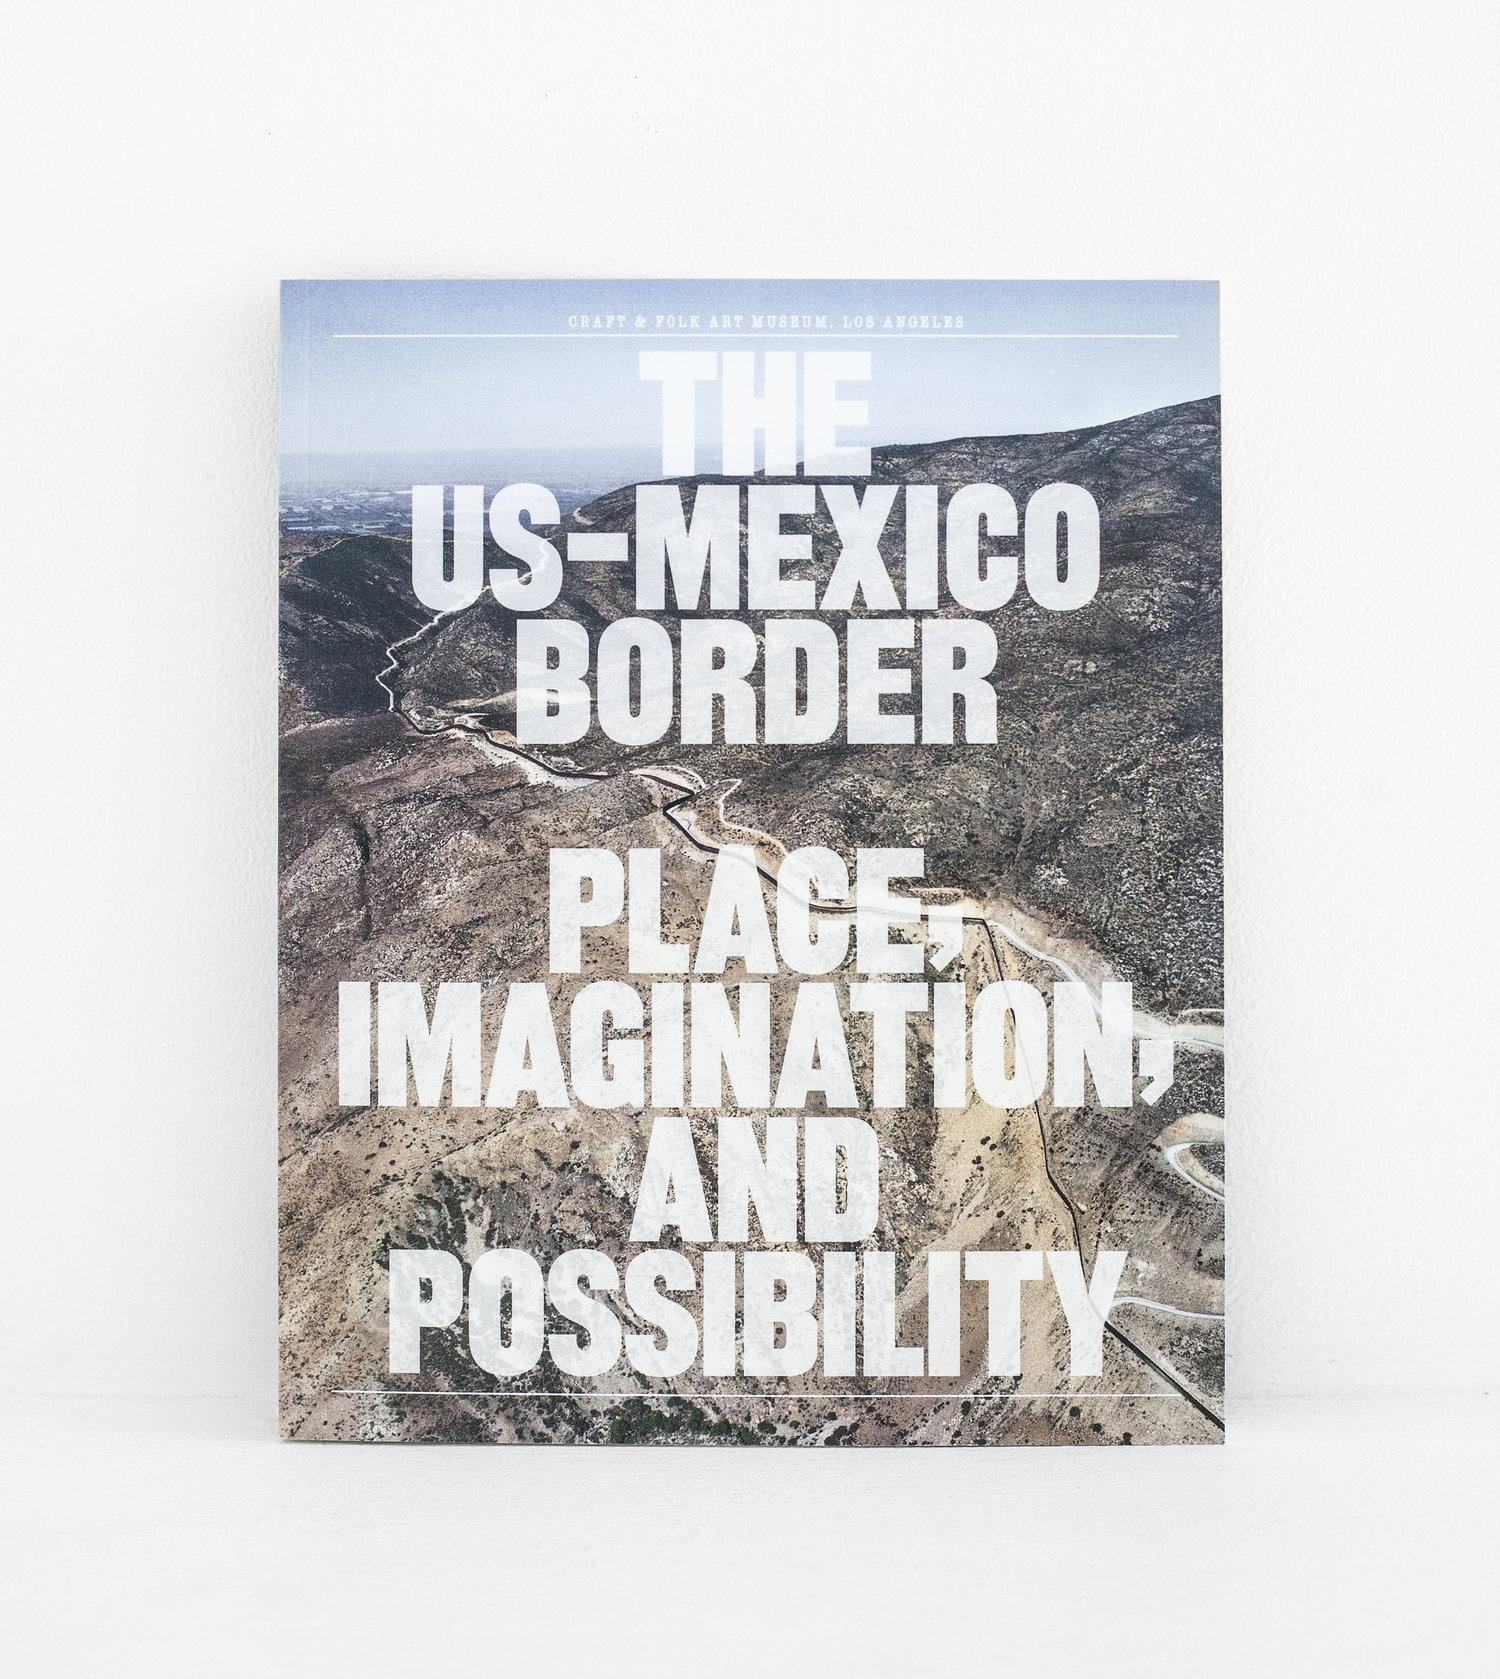 jorge-diego-etienne-us-mexico-border